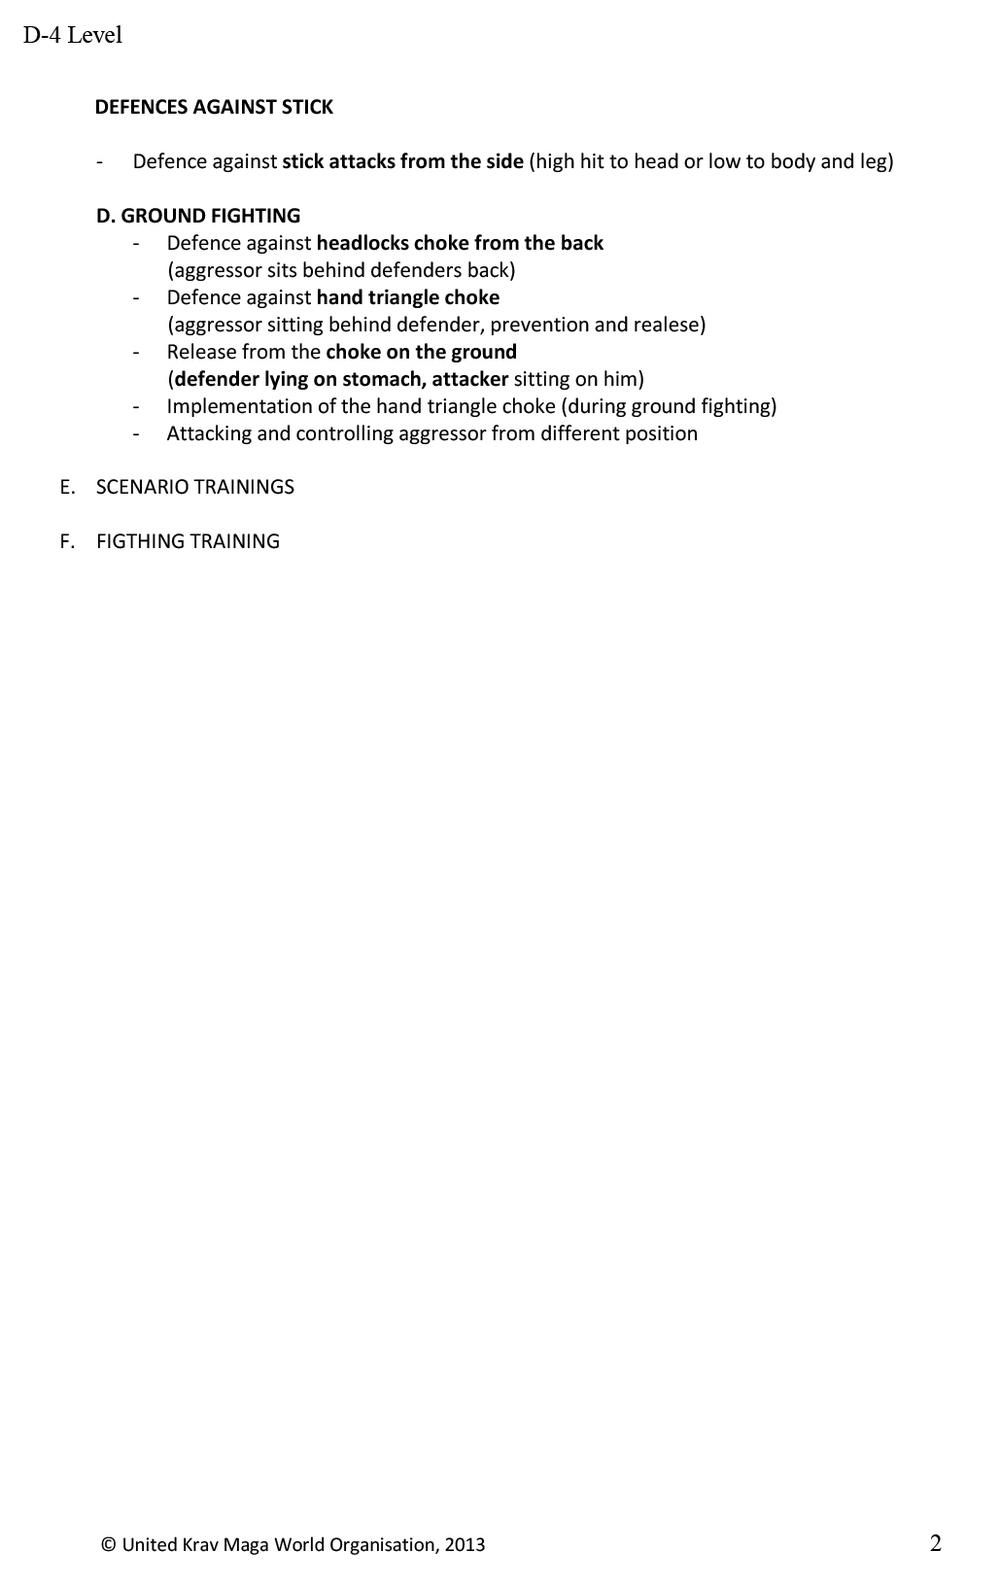 D4_ENGLISH.pdf-2.jpg